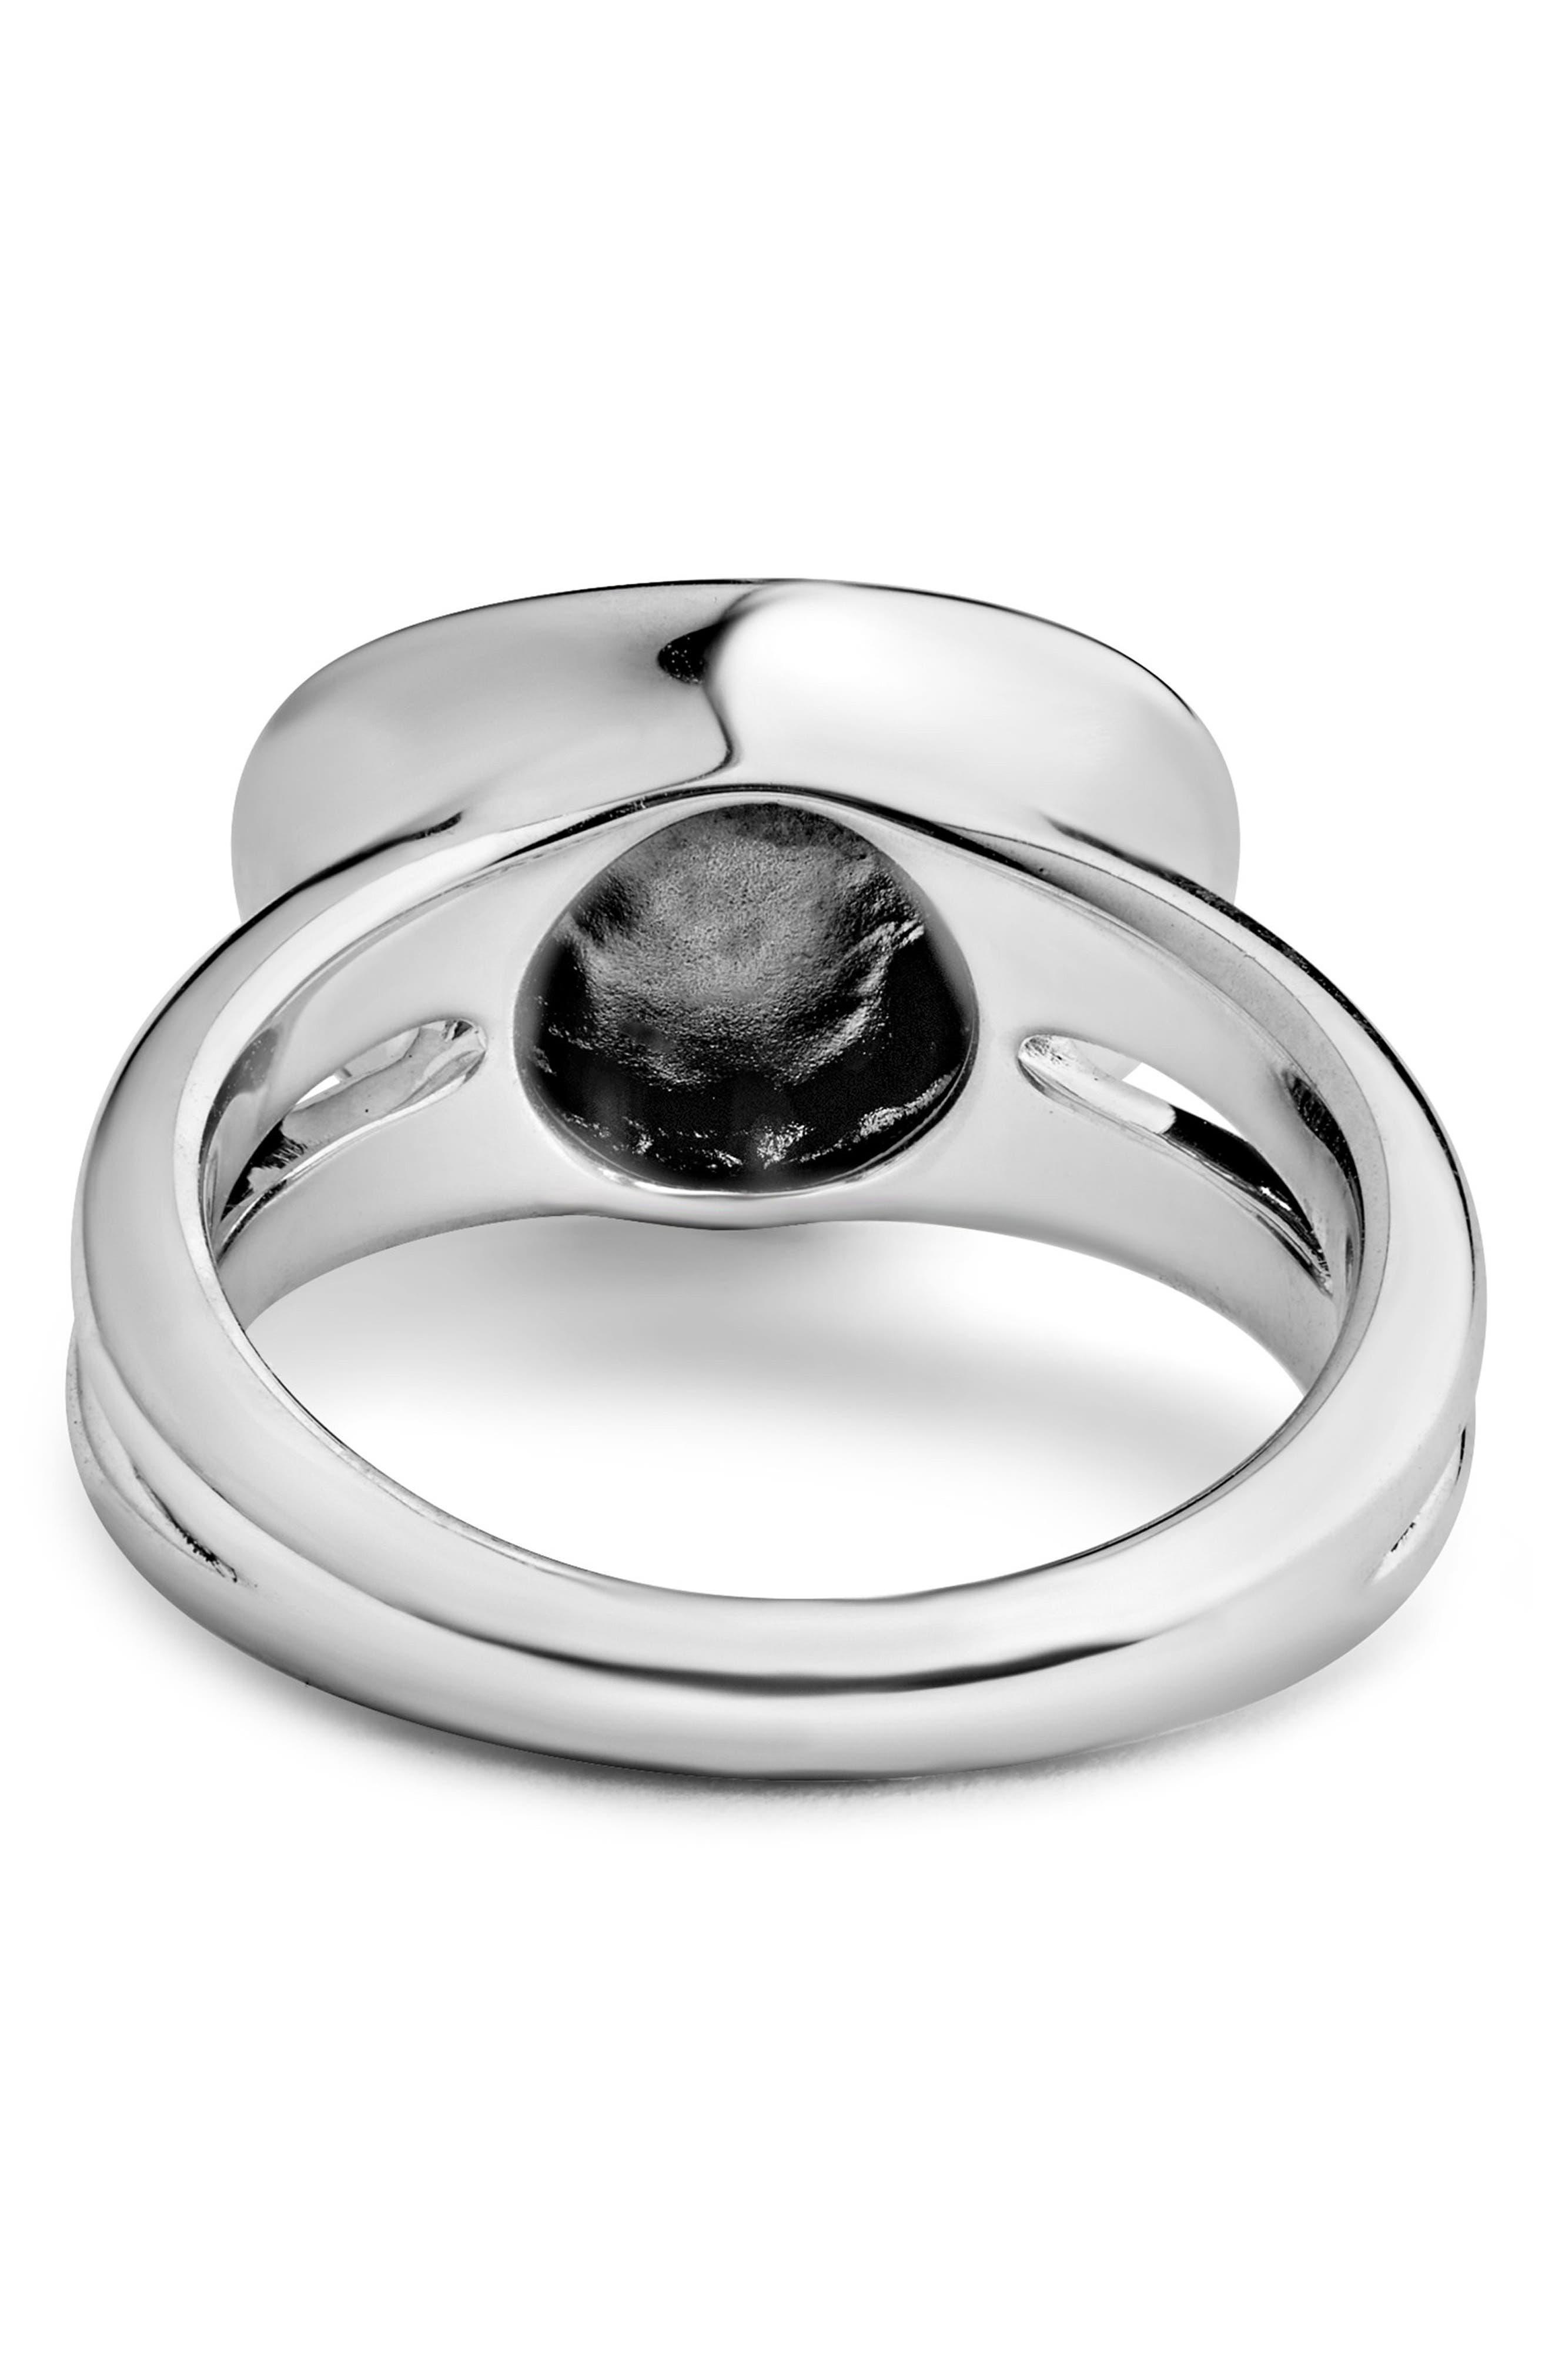 Signature Caviar Horizontal Ellipse Ring,                             Alternate thumbnail 3, color,                             SILVER